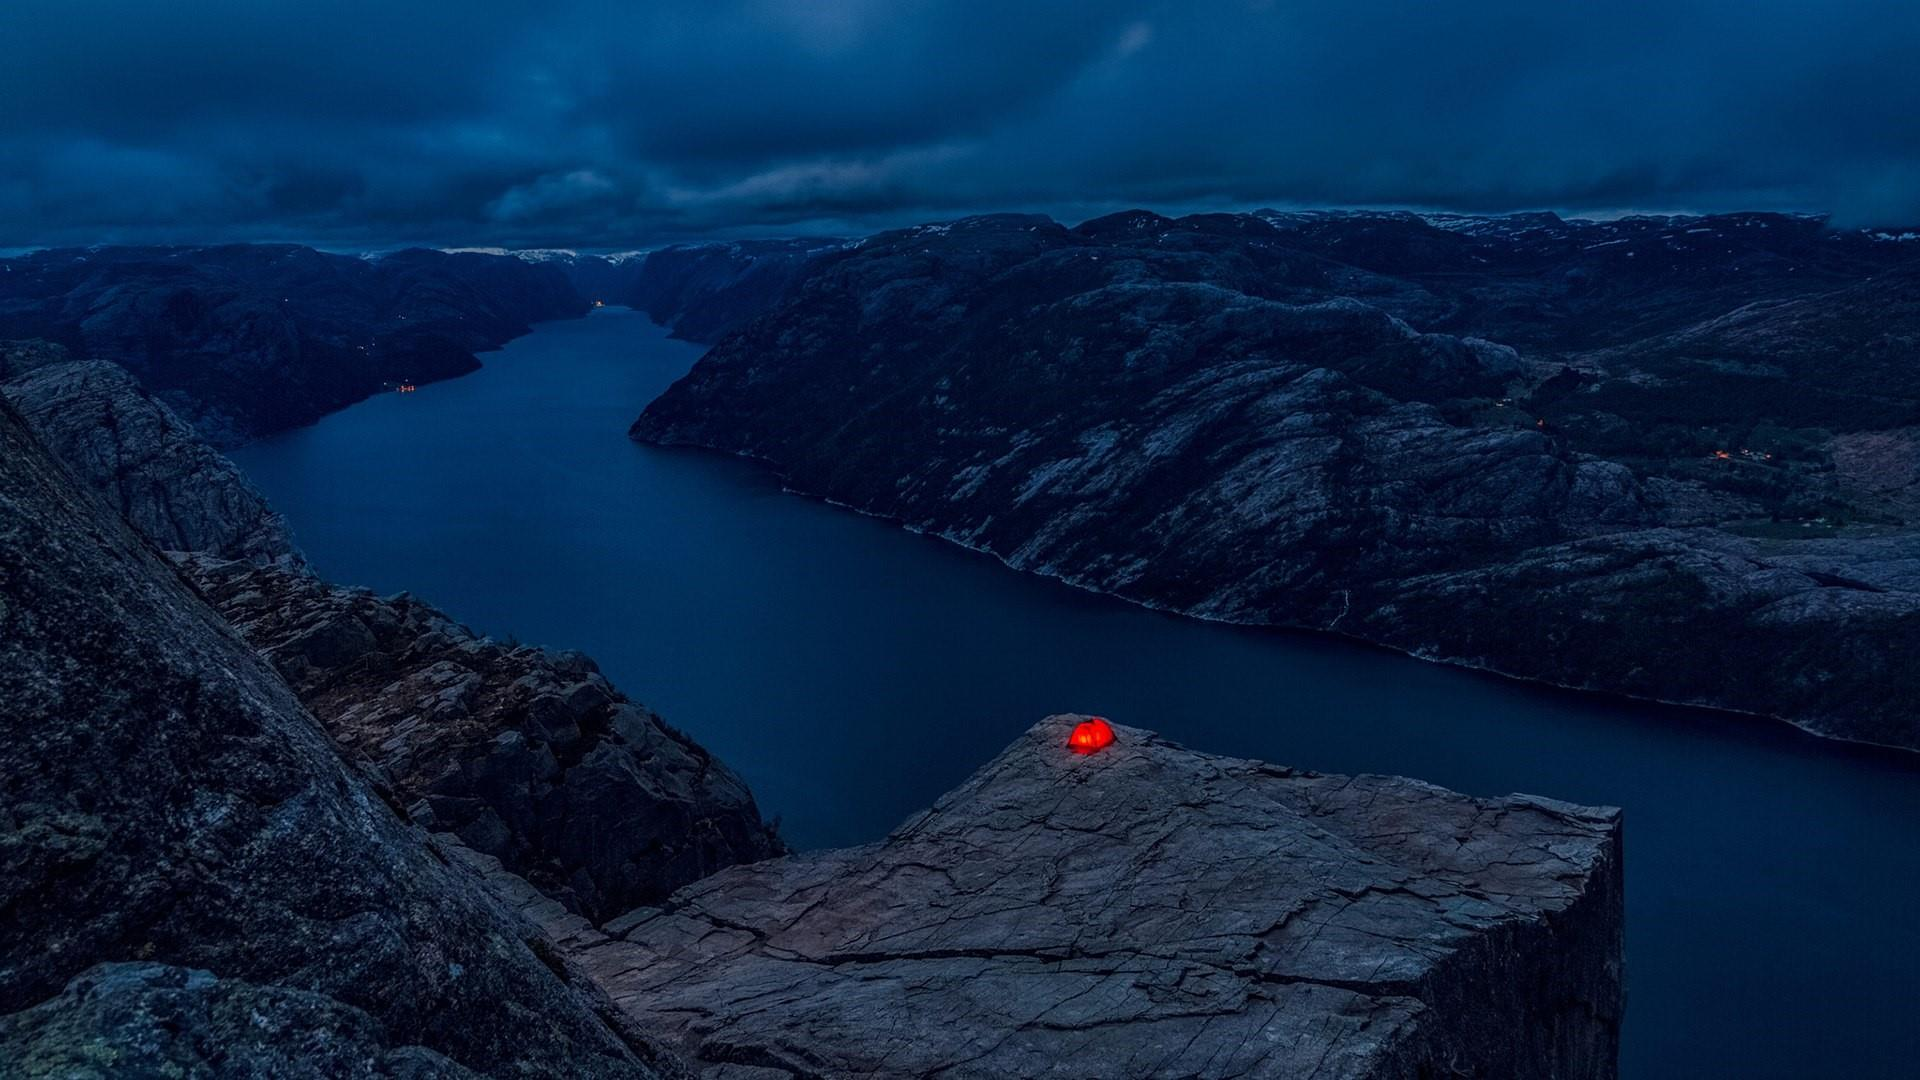 Prekestolen (Preikestolen) adrenalin camping wallpaper